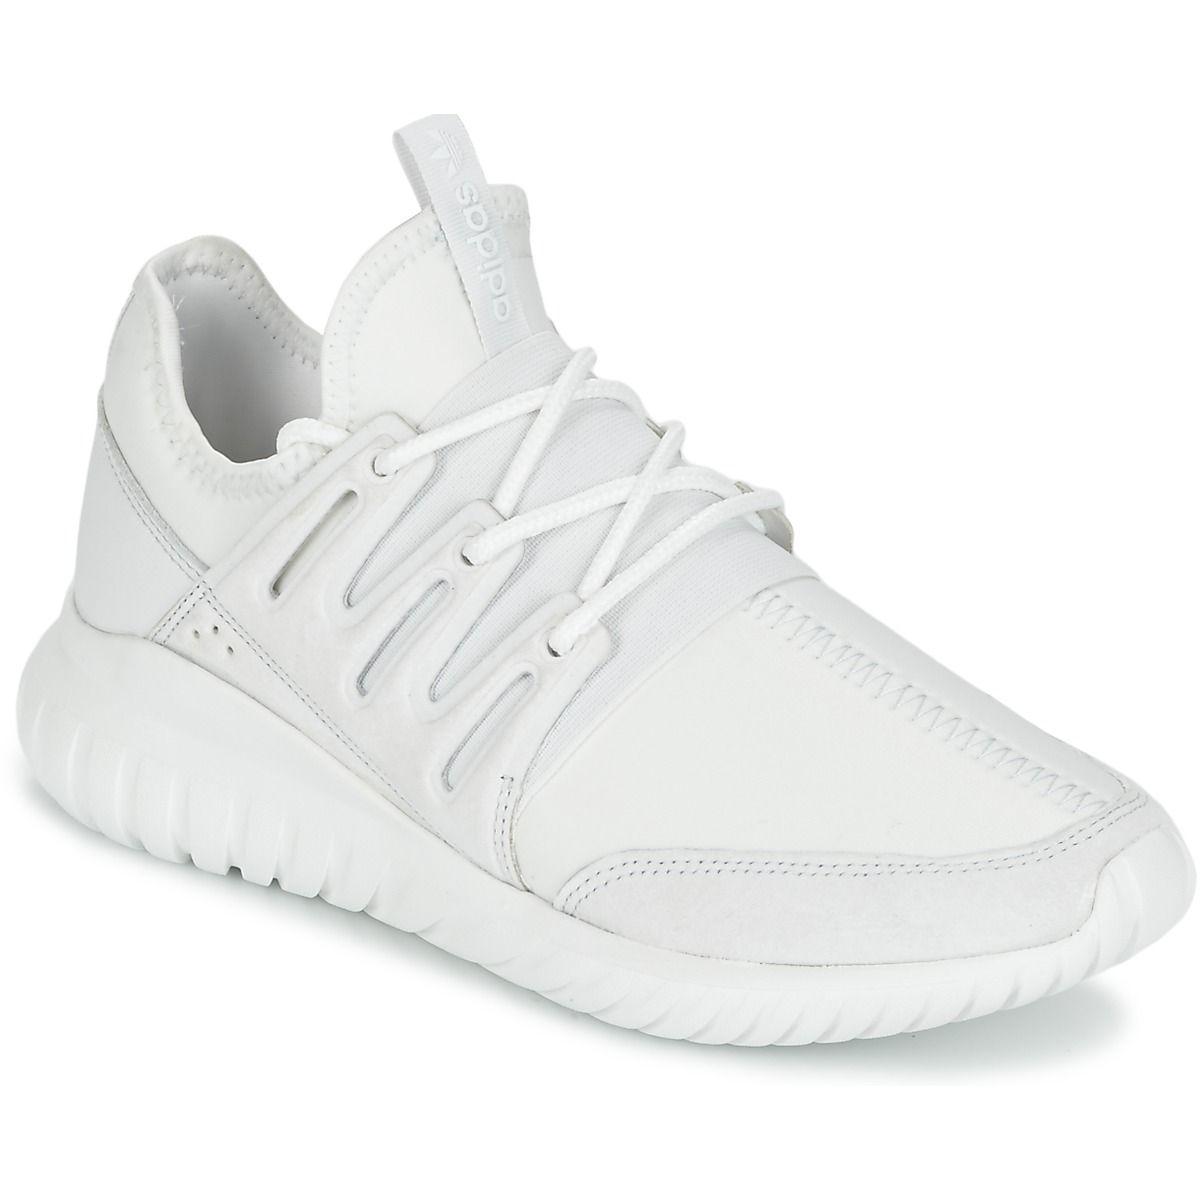 Adidas Tubular pas cher blanche